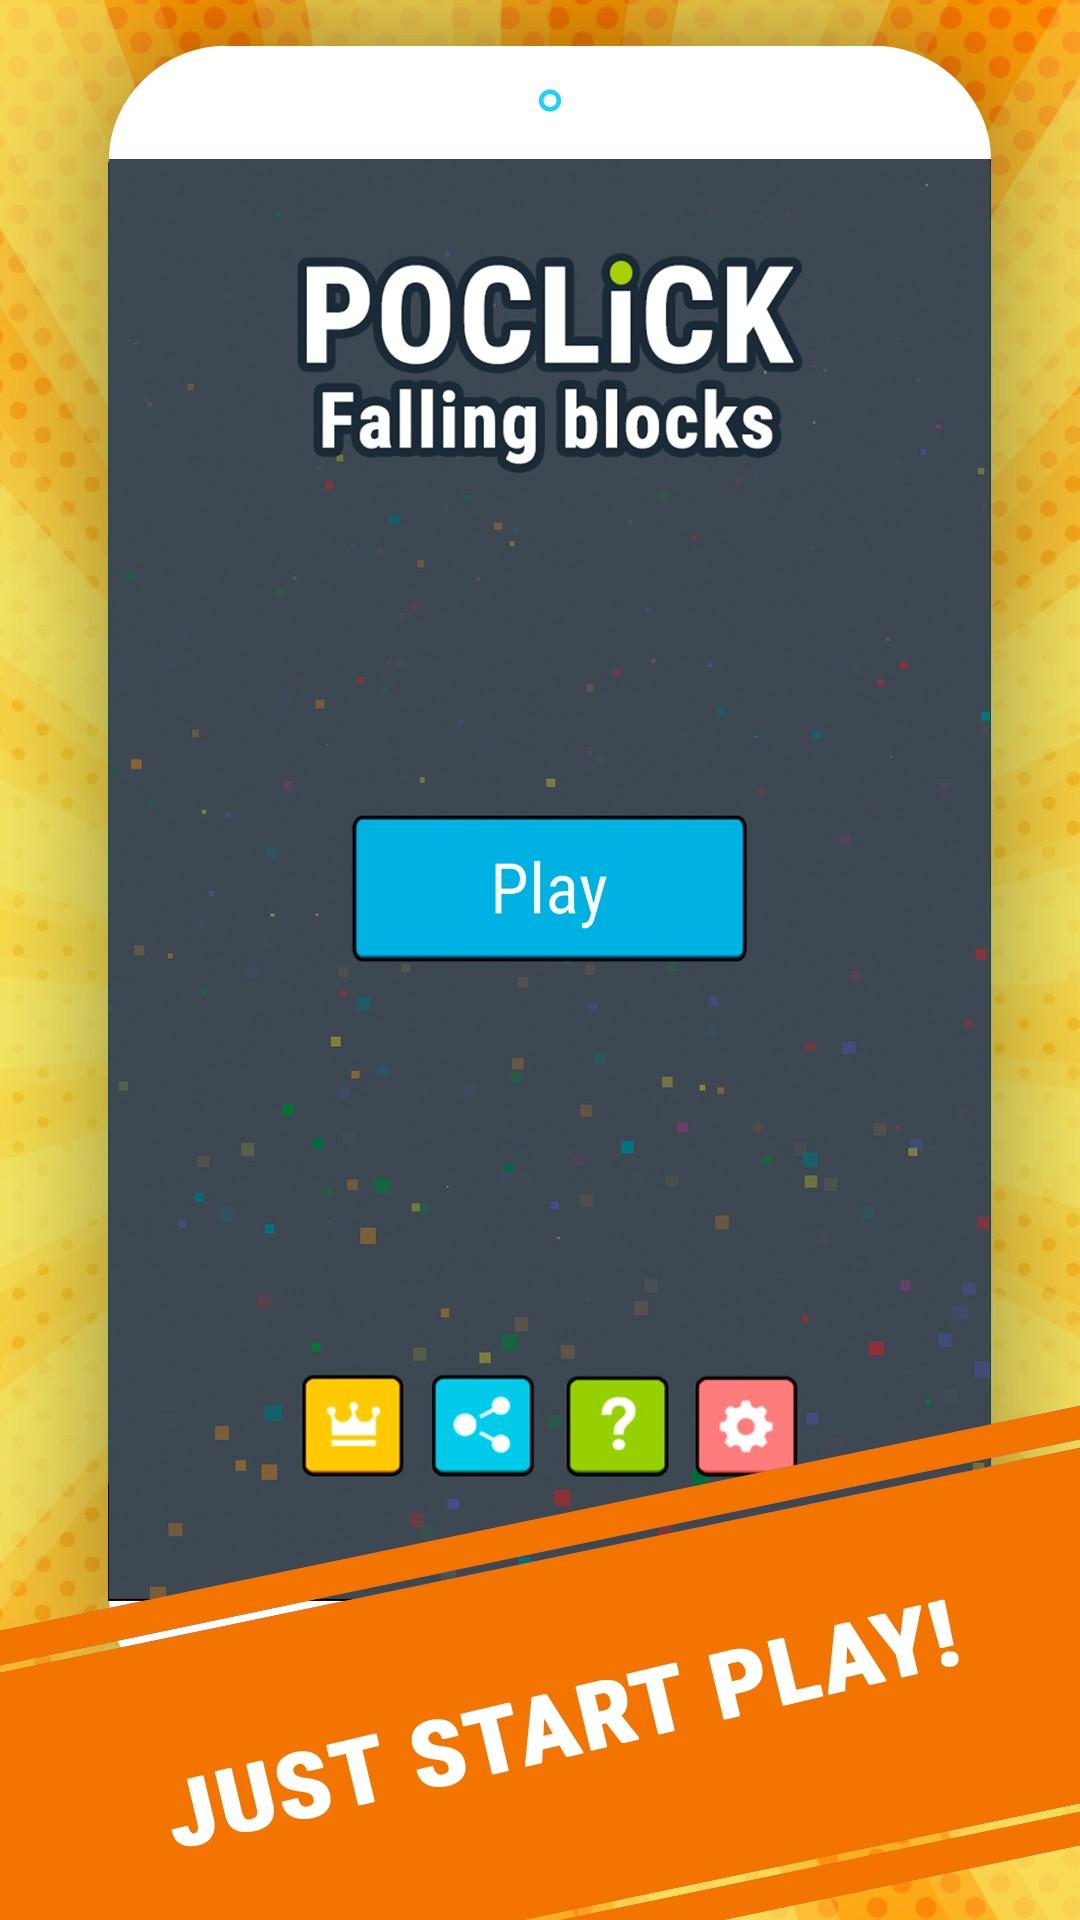 Poclick: Falling Blocks